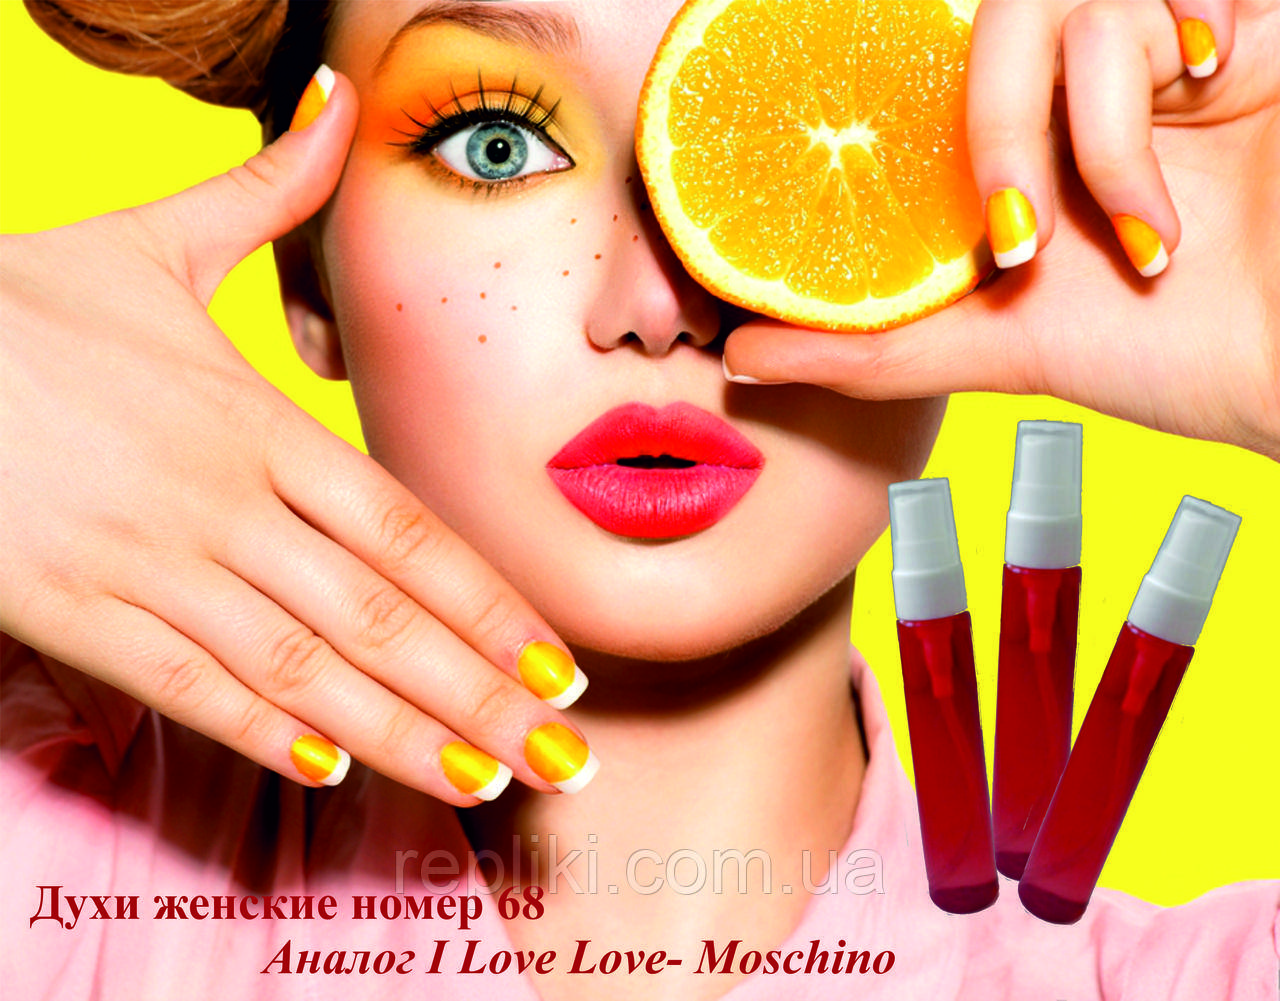 Люкс КОПИИ. Стойкость до 12 ч!! Франция. Духи женские номер 68 - аналог I Love Love- Moschino - 23 мл., фото 1